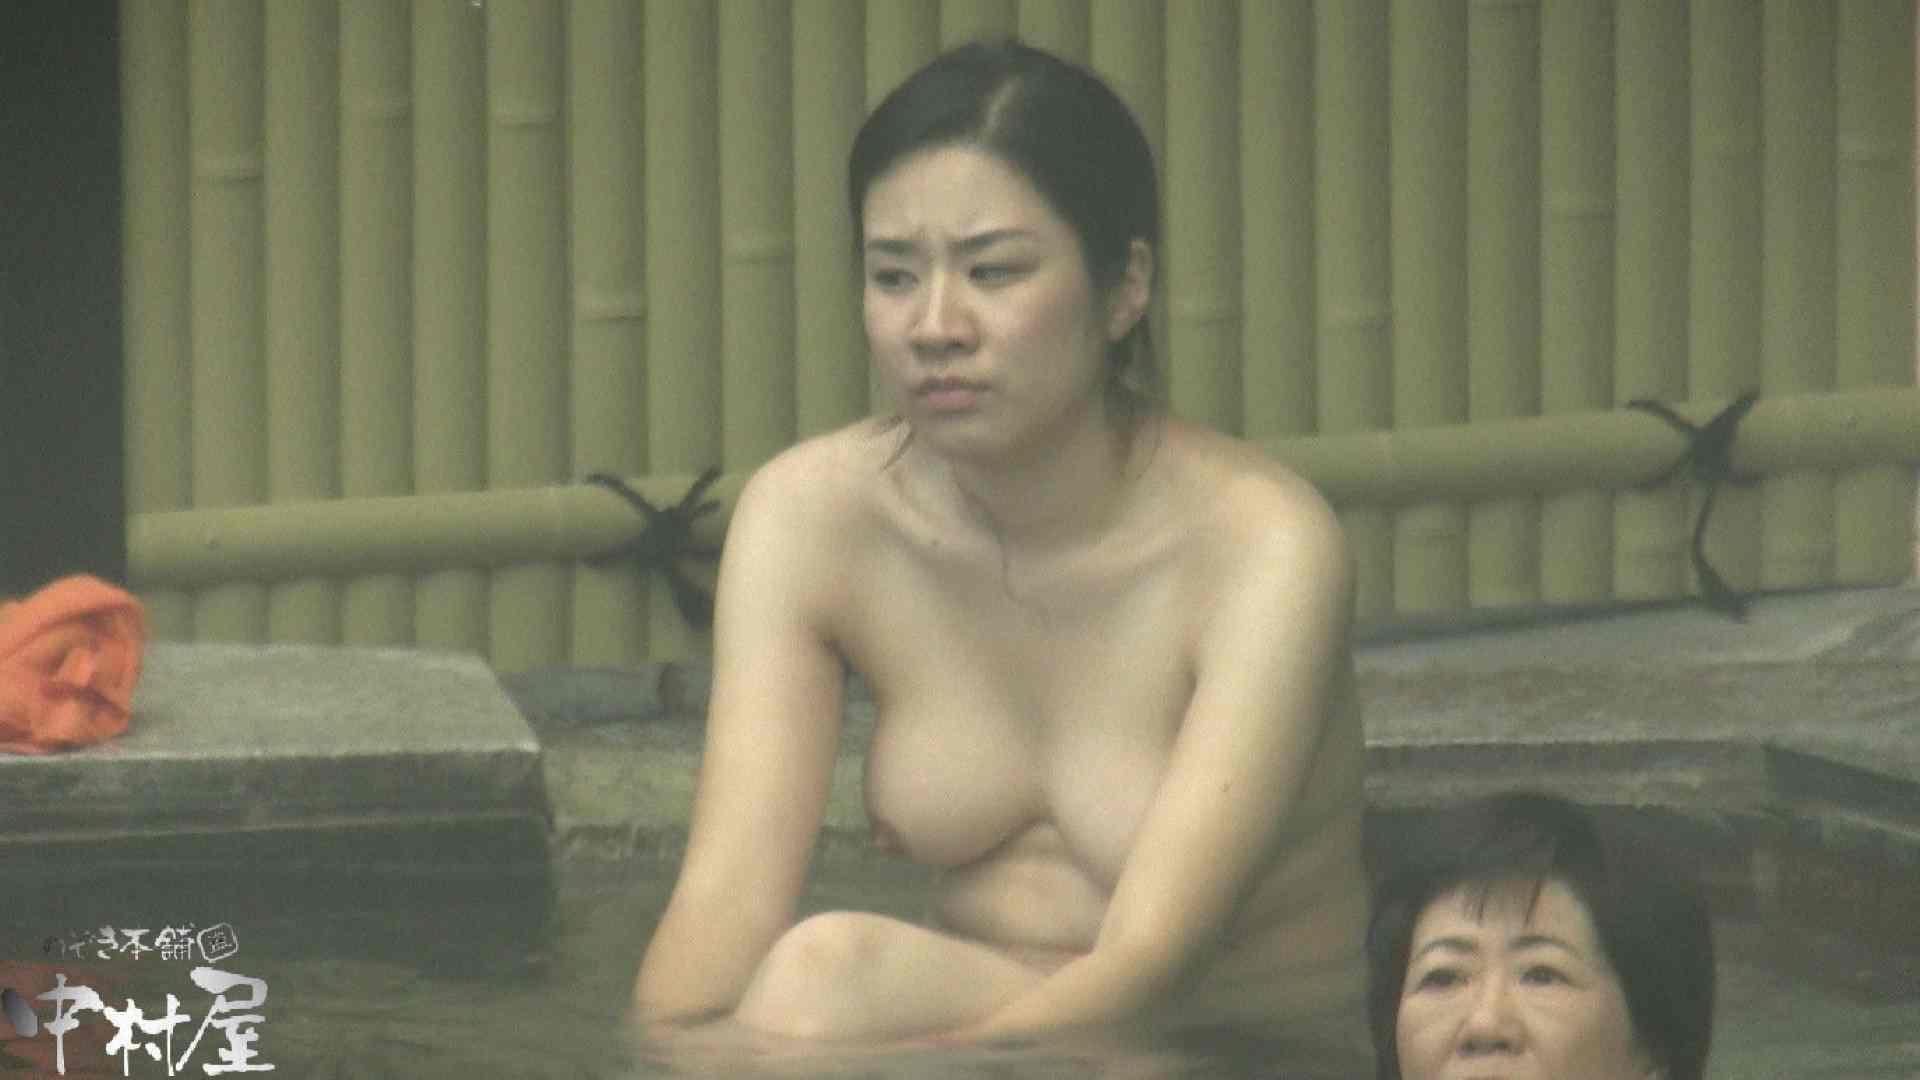 Aquaな露天風呂Vol.913 盗撮大放出 ヌード画像 65連発 28